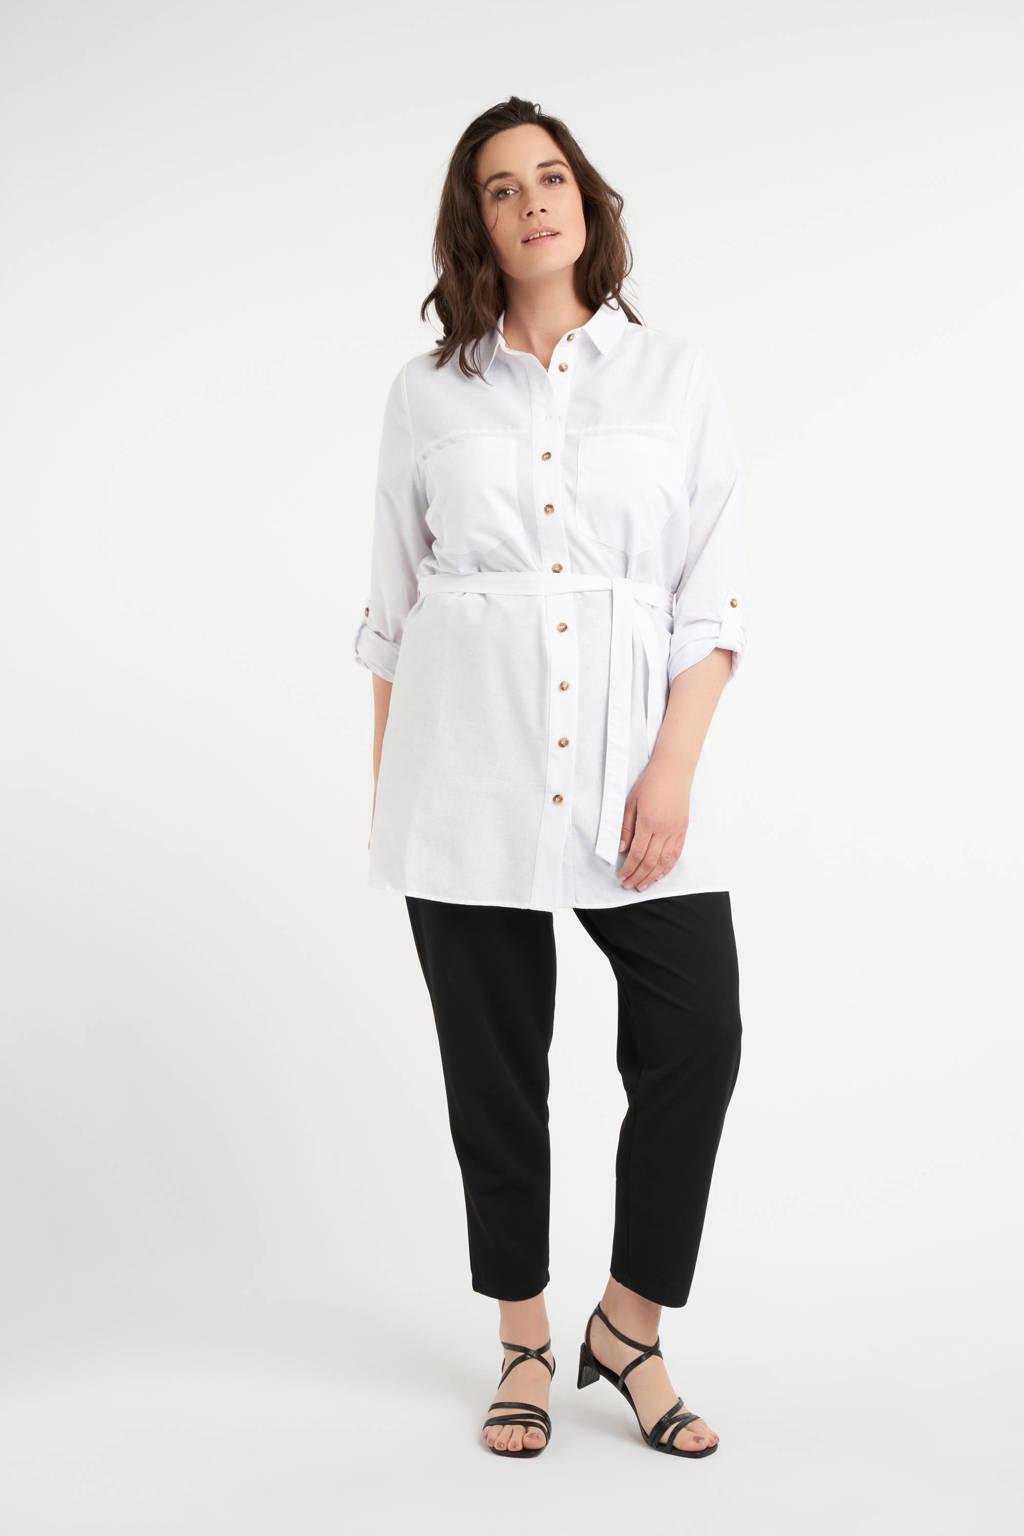 MS Collection jasje met knoopceintuur wit, Wit